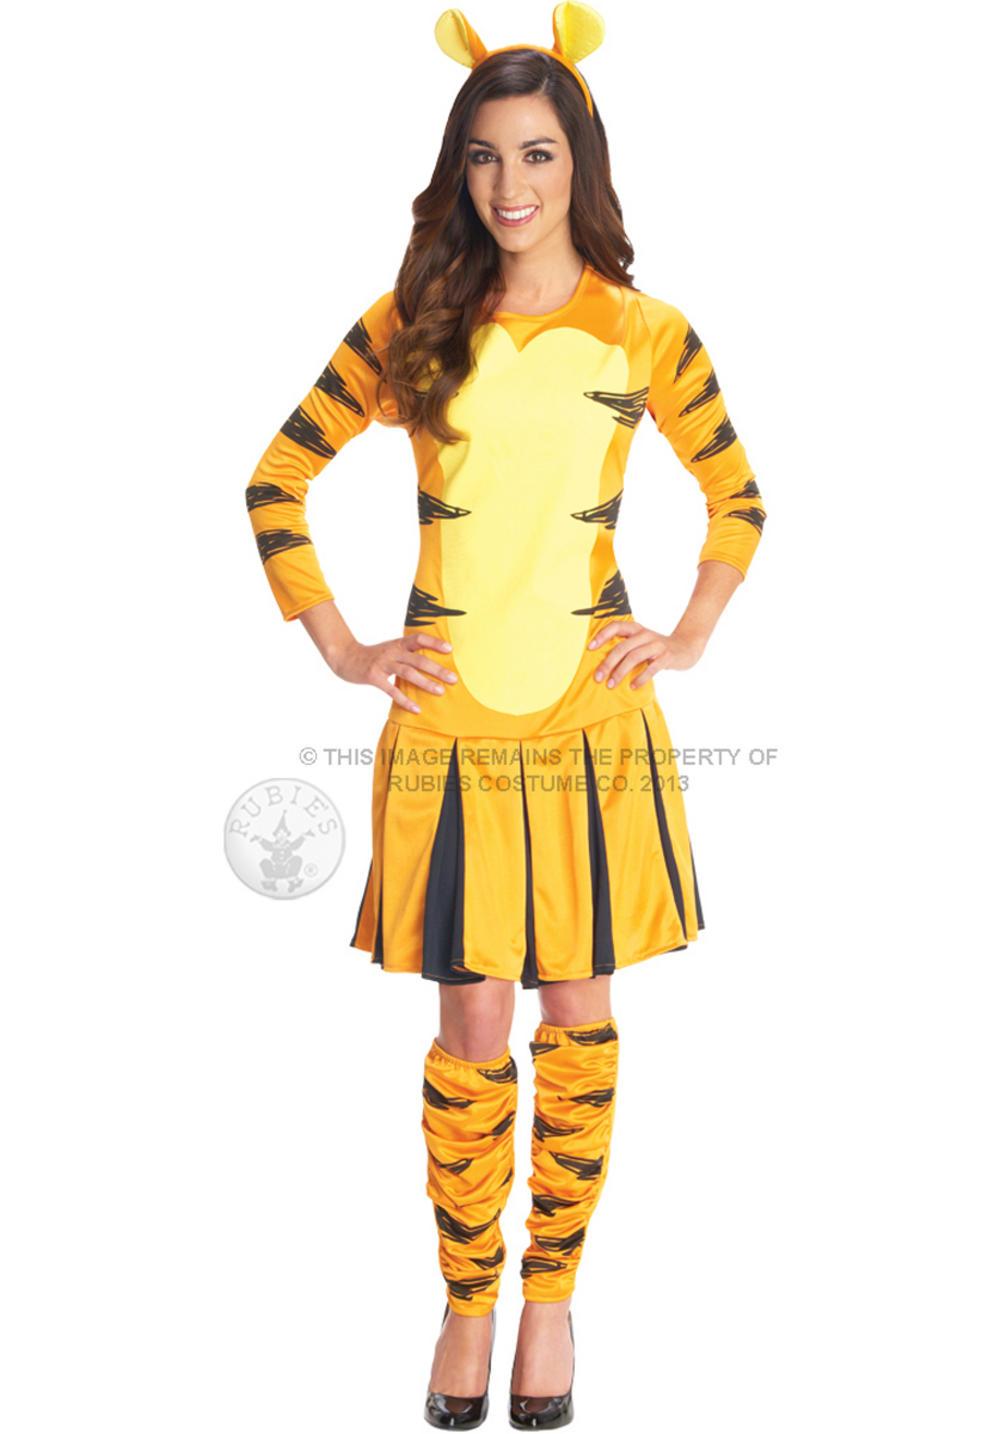 Adult costume tigger